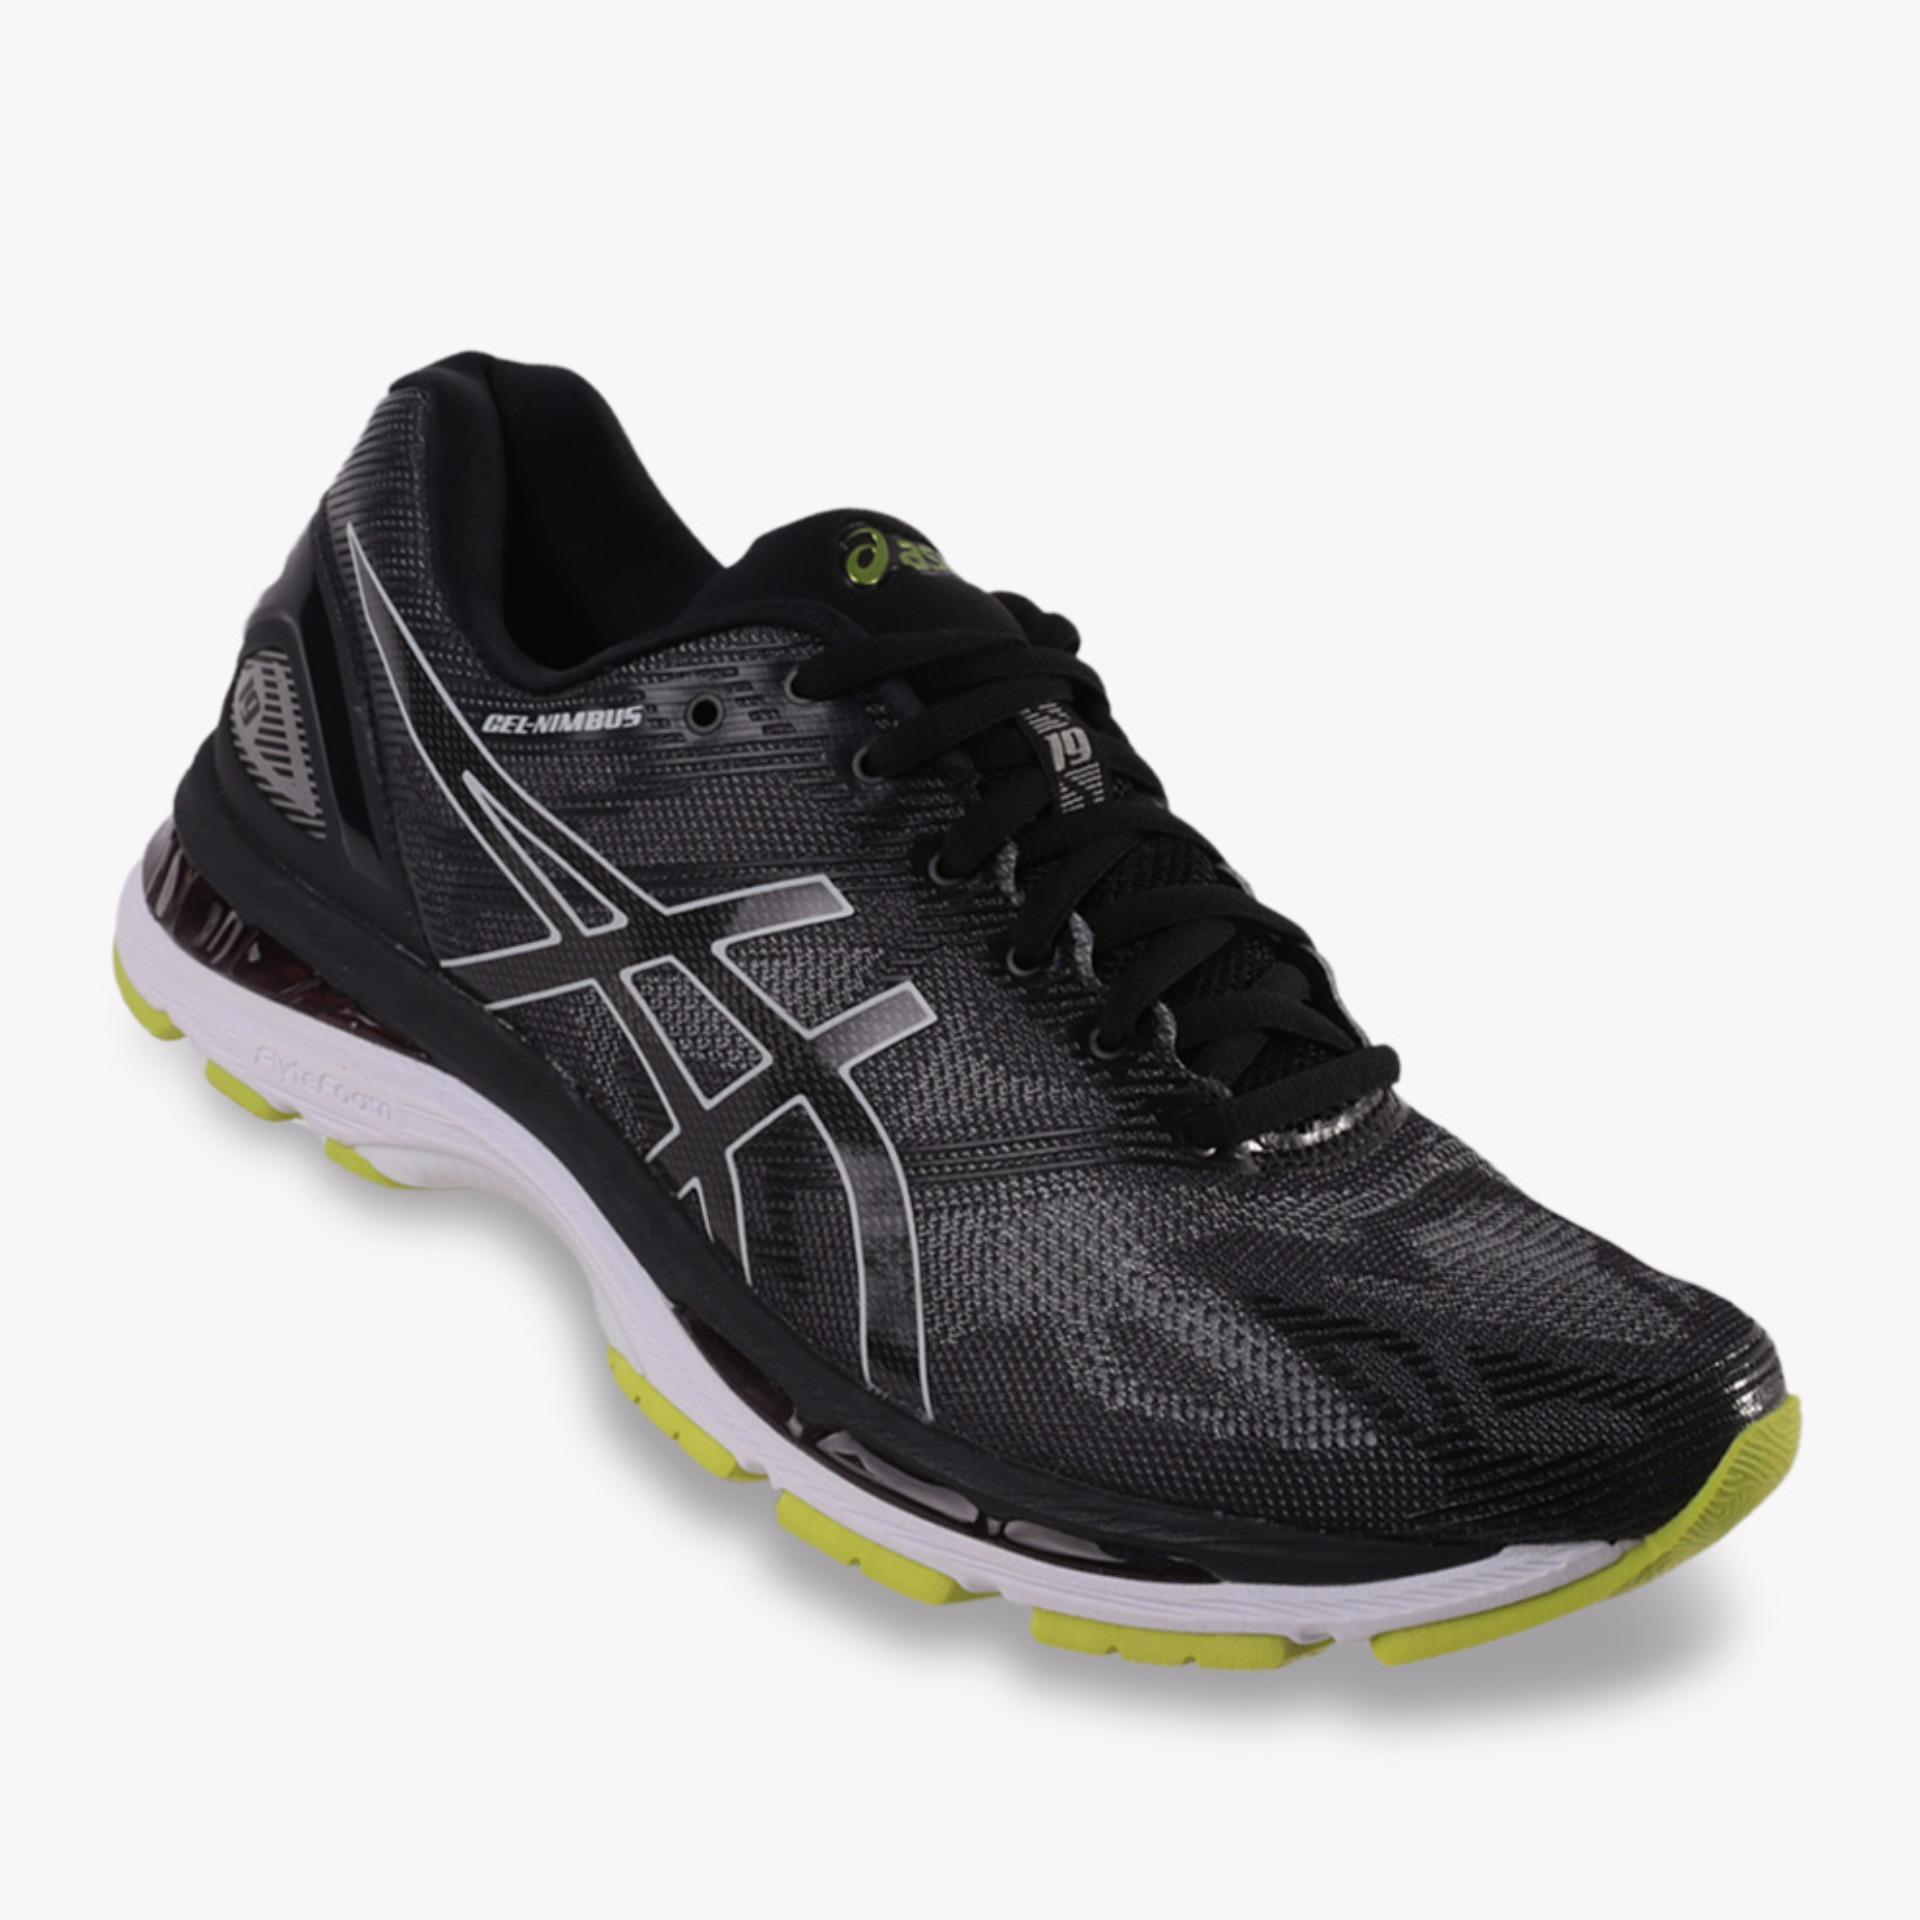 Asics Gel Nimbus 19 Men S Running Shoes Standard Wide Hitam Diskon Indonesia